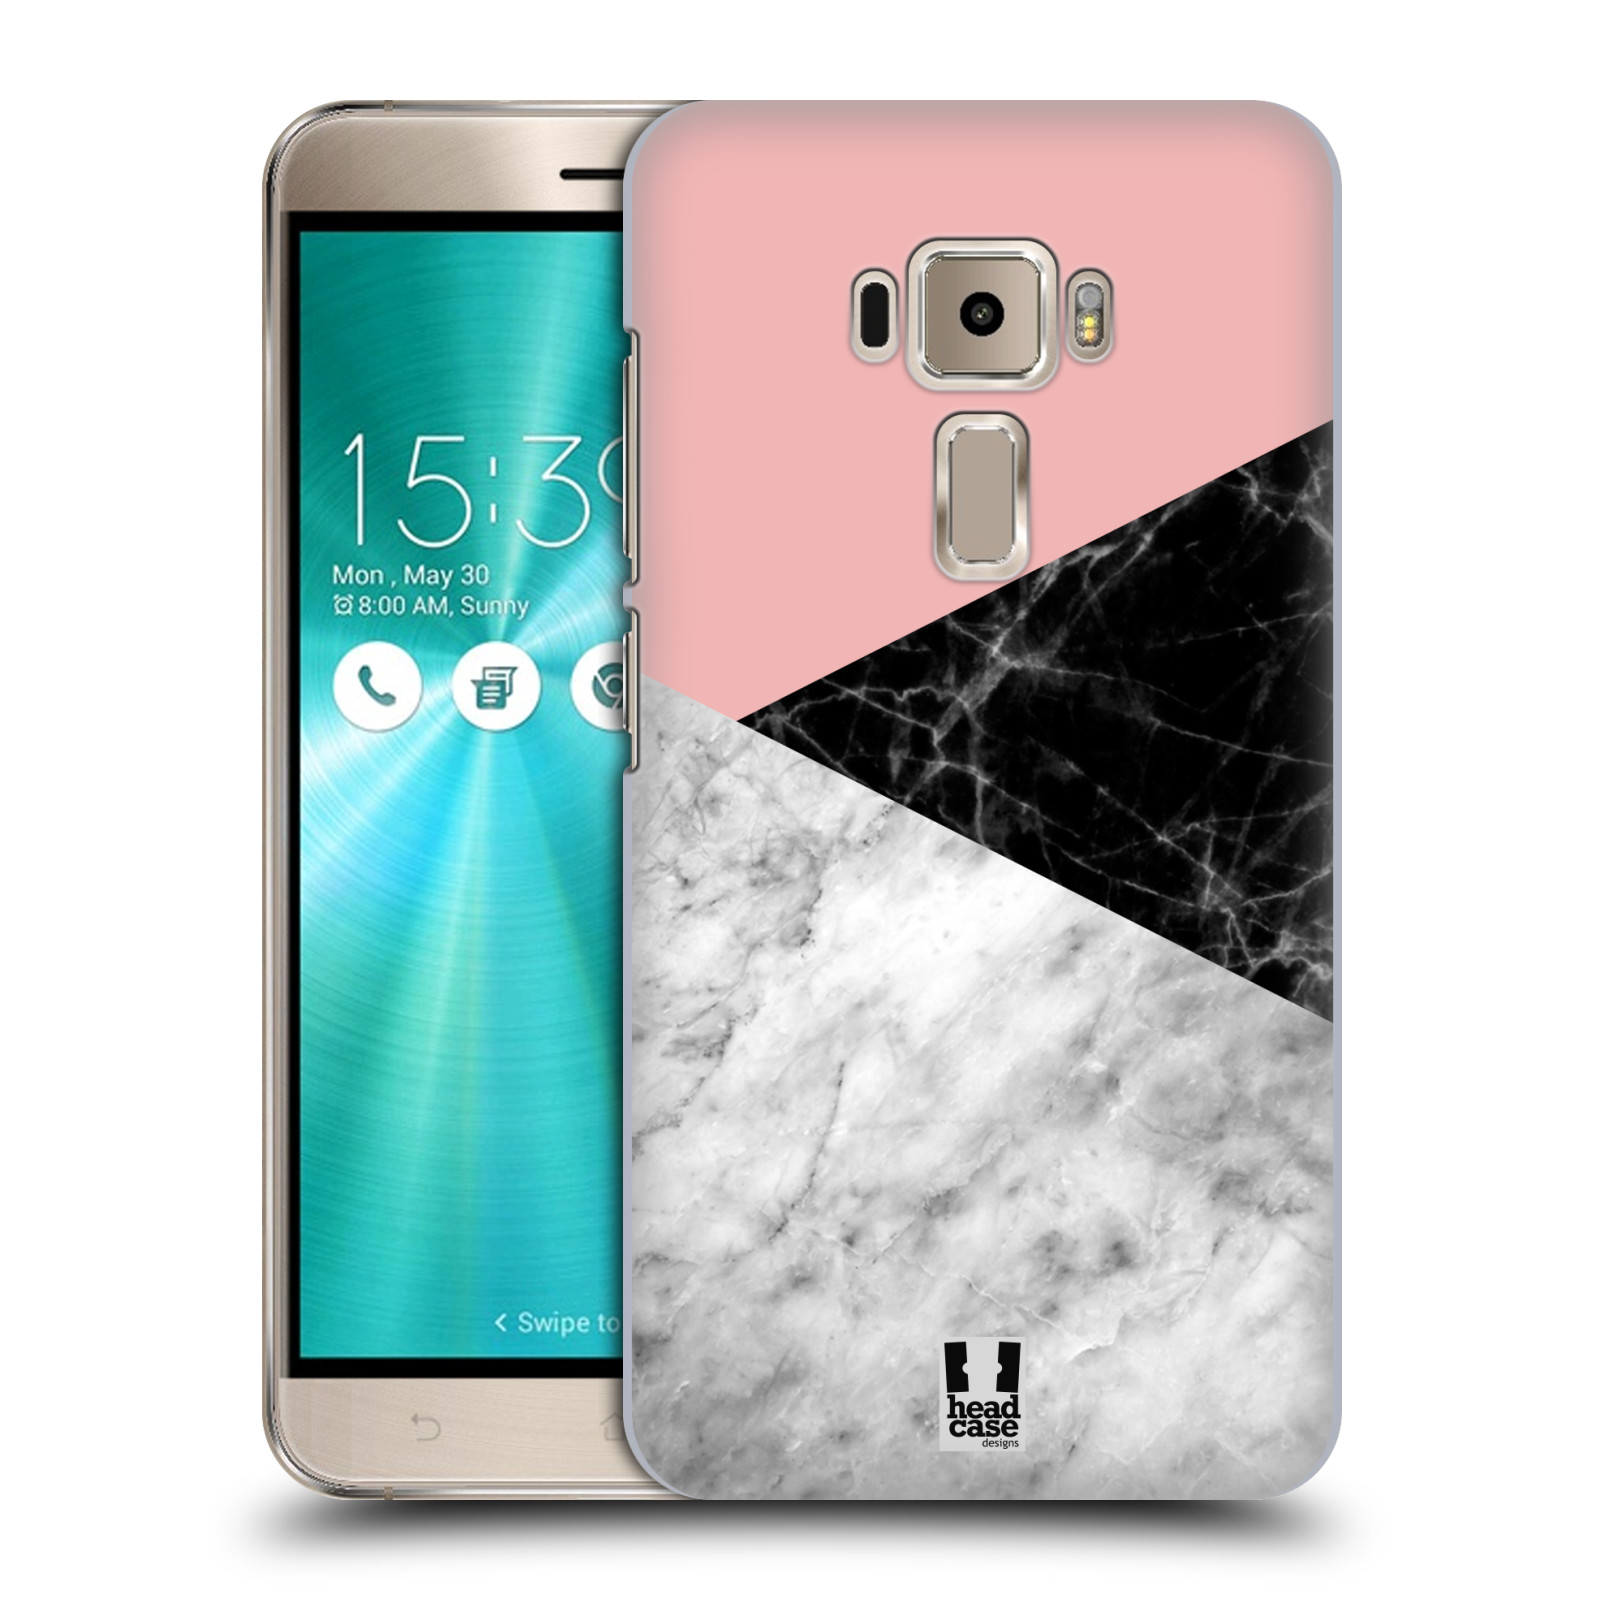 Plastové pouzdro na mobil Asus ZenFone 3 ZE520KL - Head Case - Mramor mix